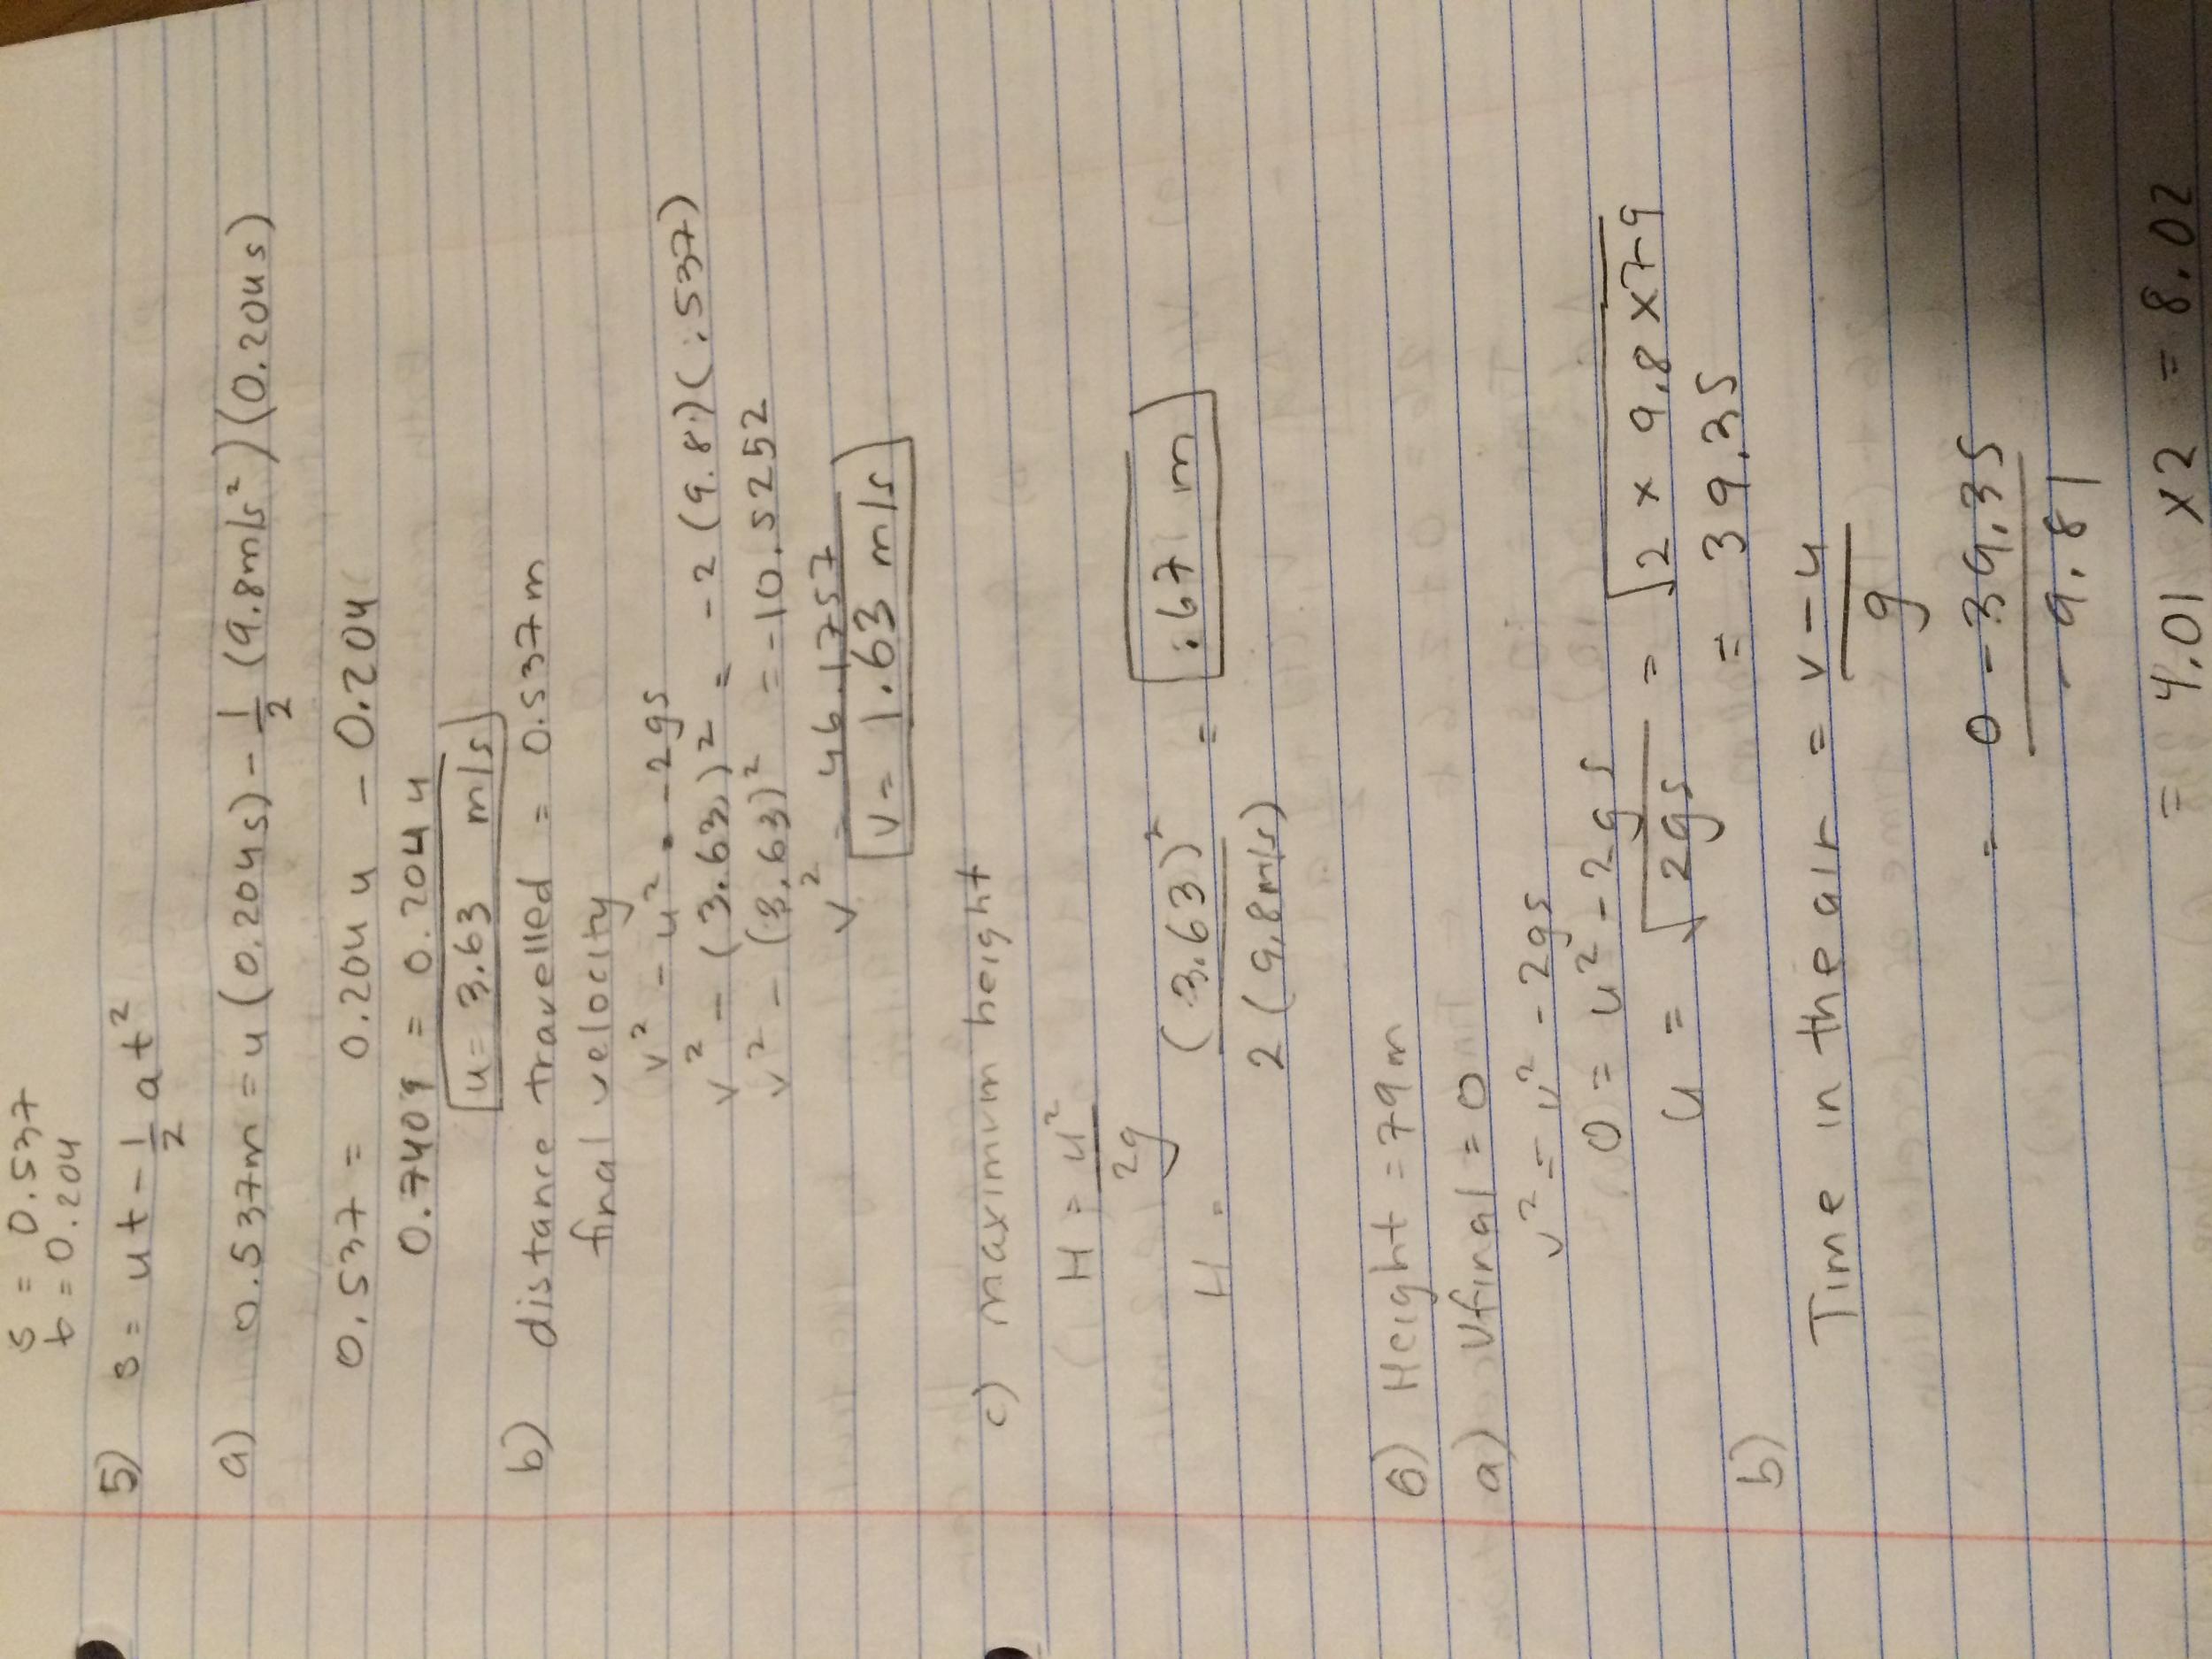 i am stuck on homework